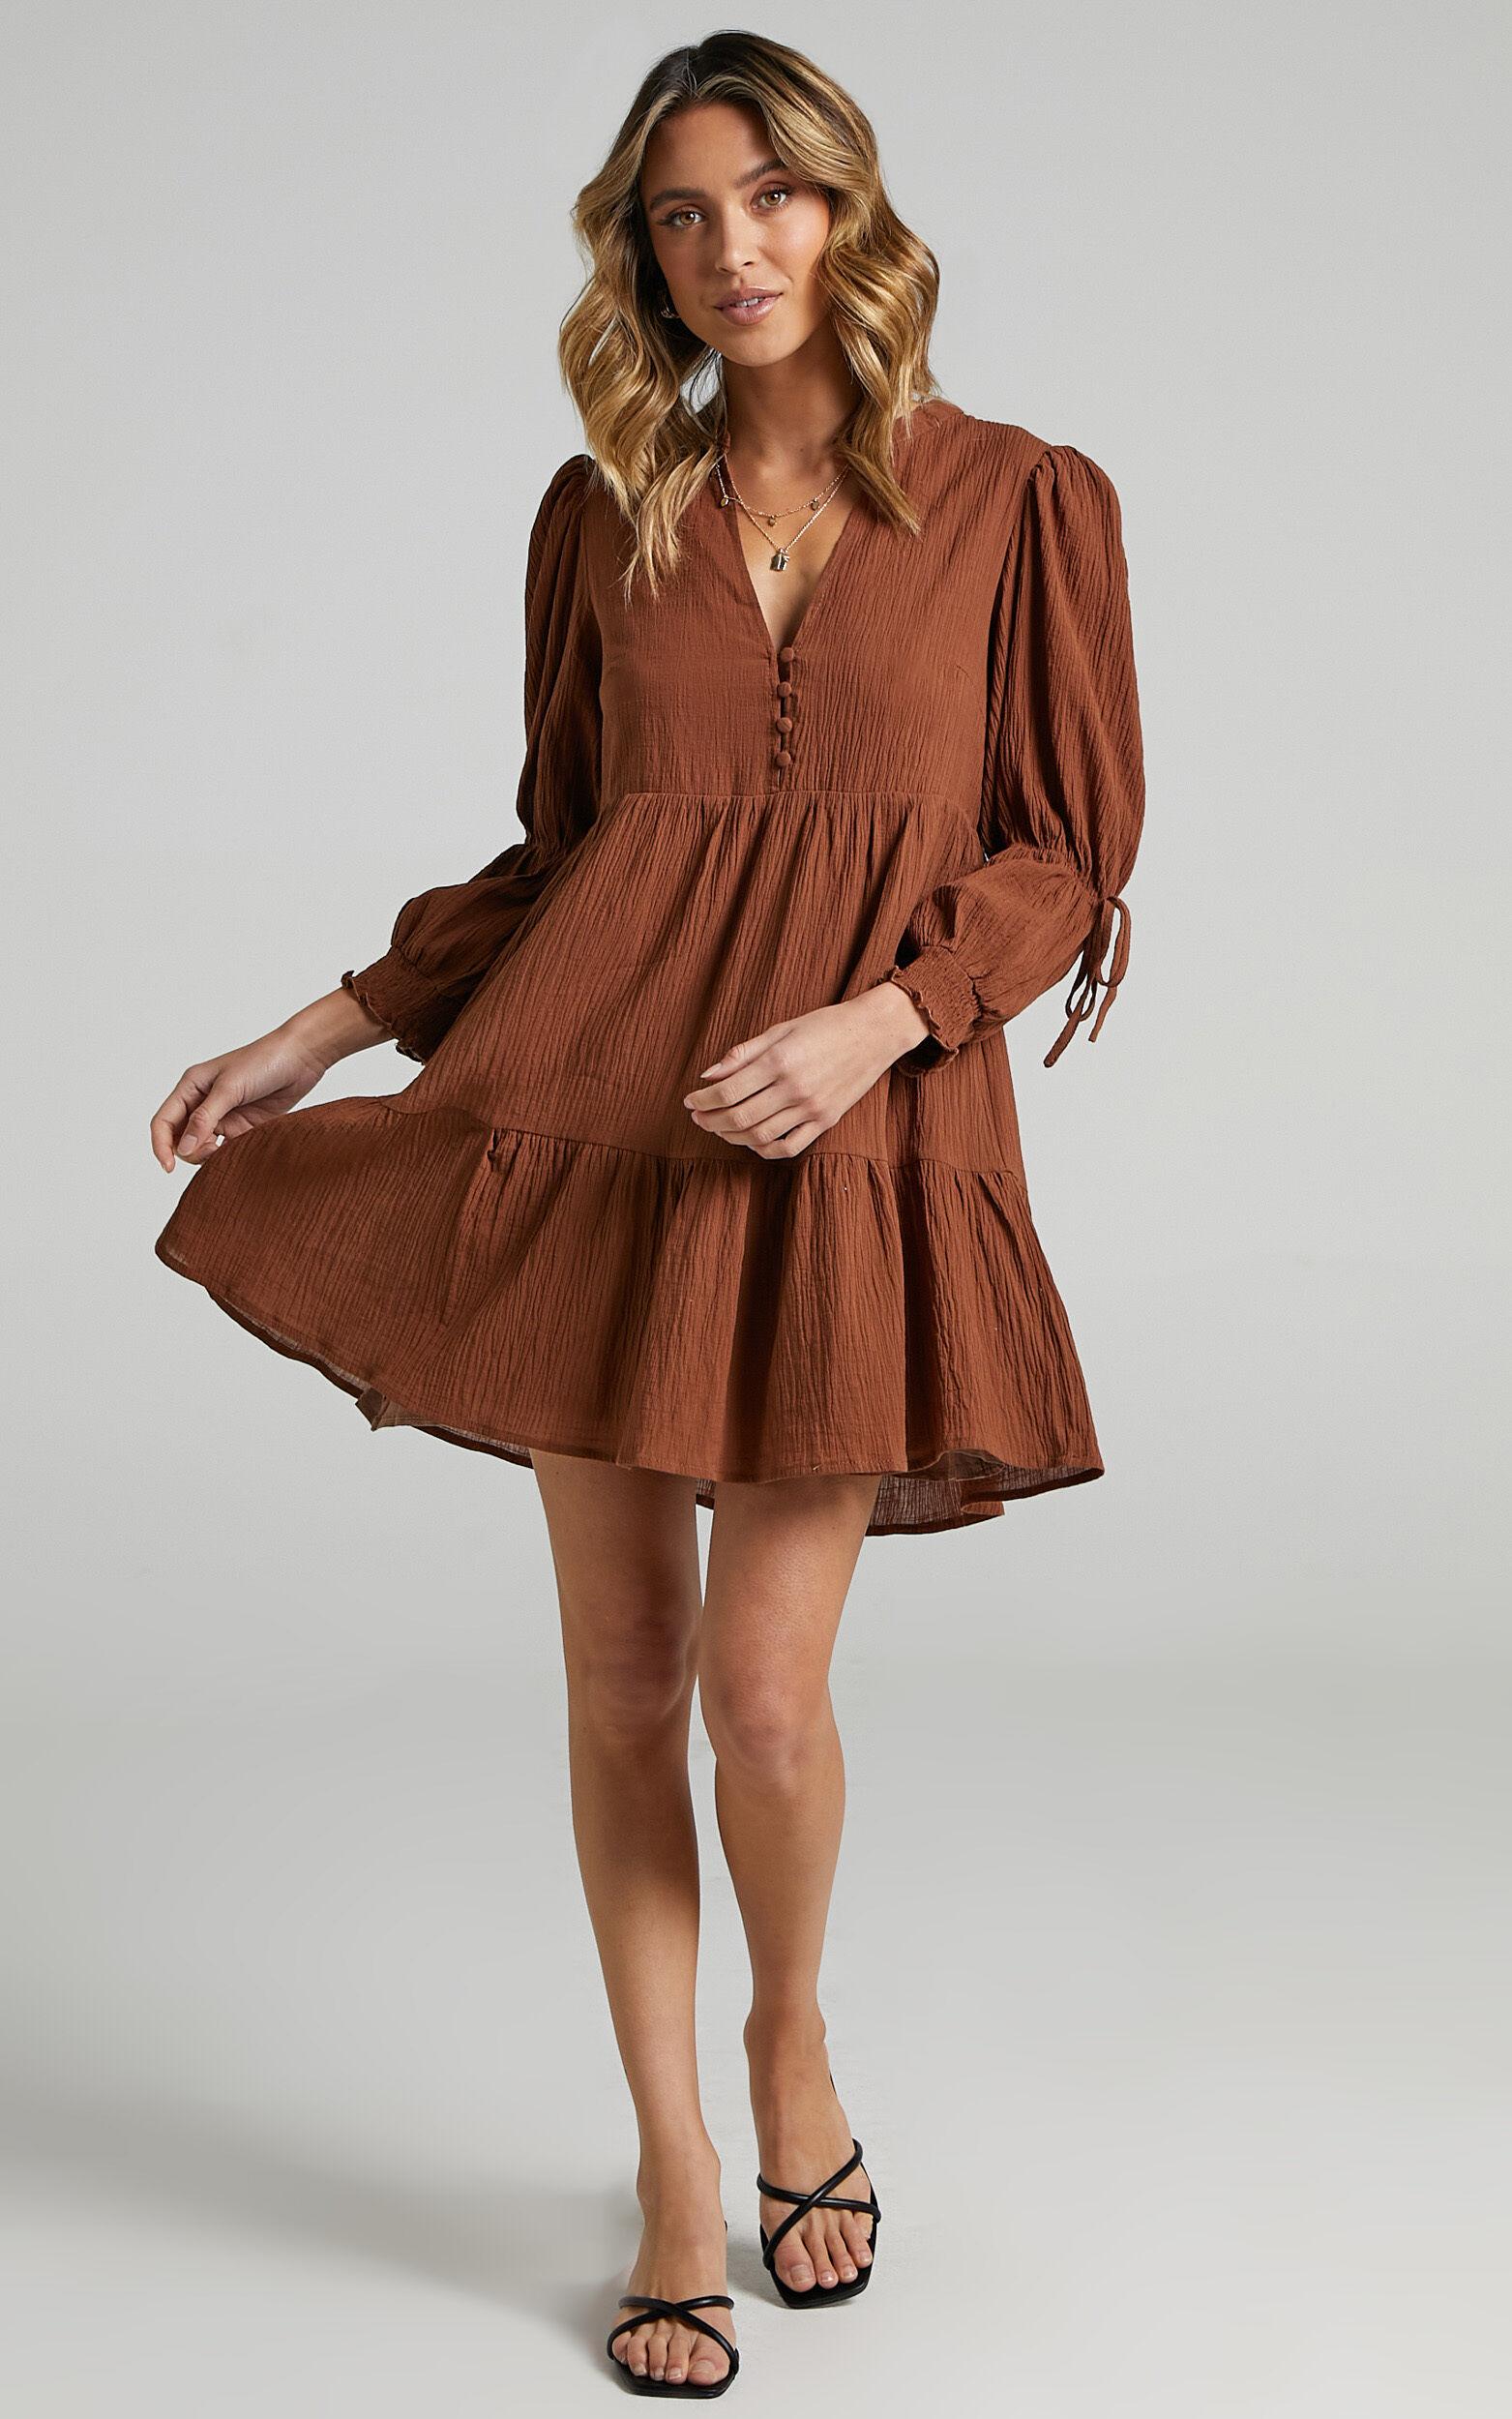 Orald Dress in Chocolate - 06, BRN1, super-hi-res image number null